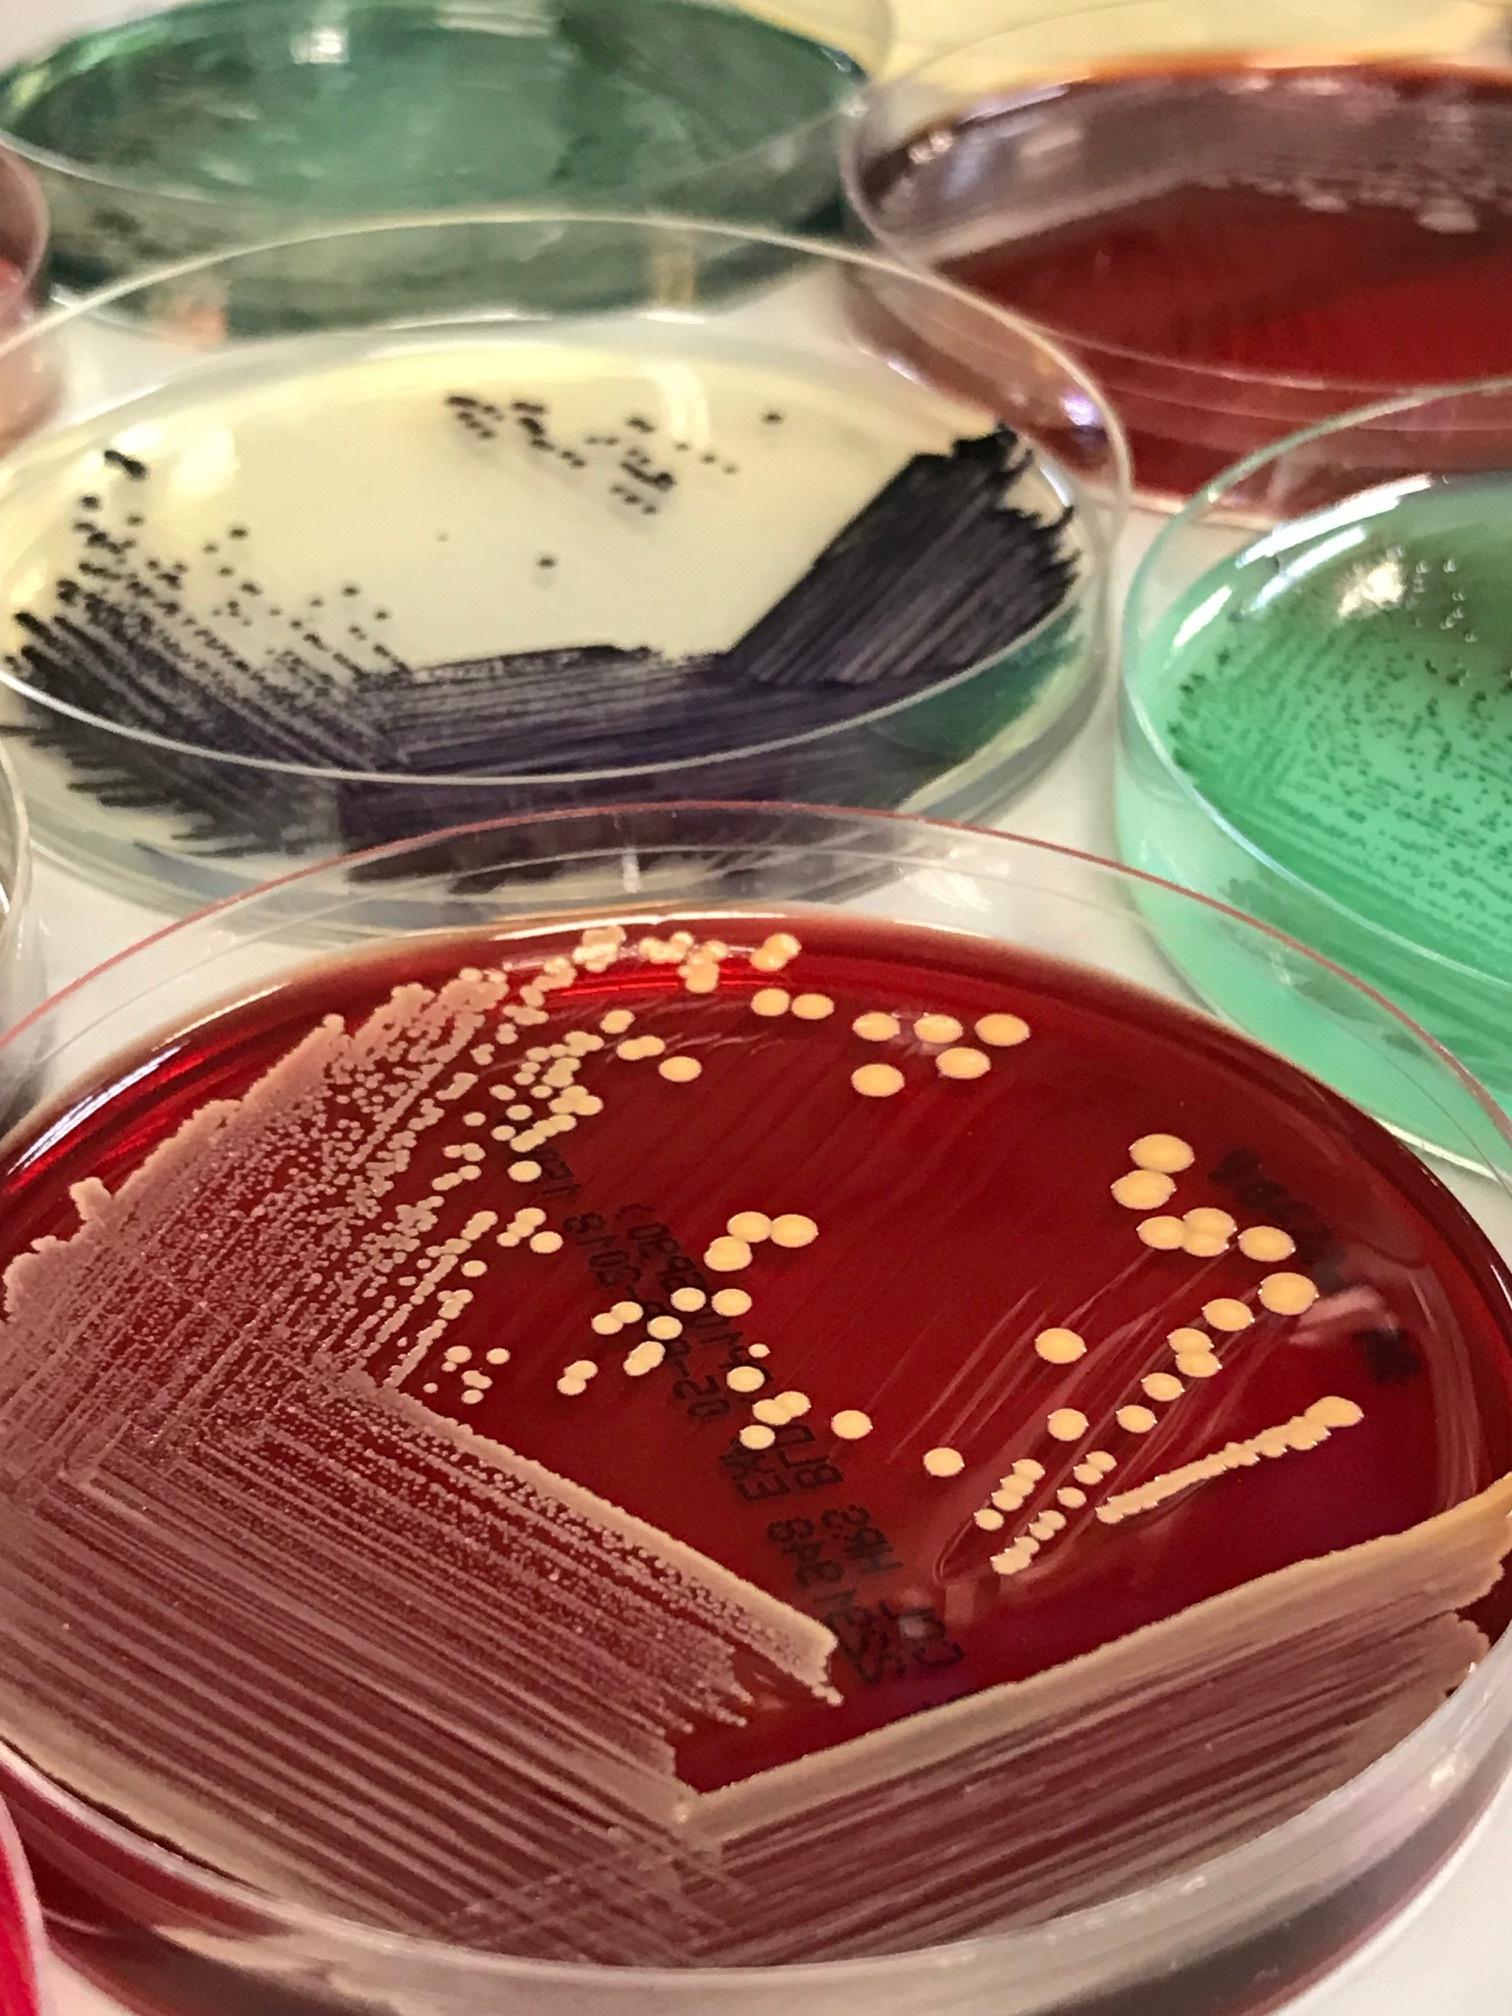 Methicillin-resistant Staphylococcus aureus. Photo credits to Calvin